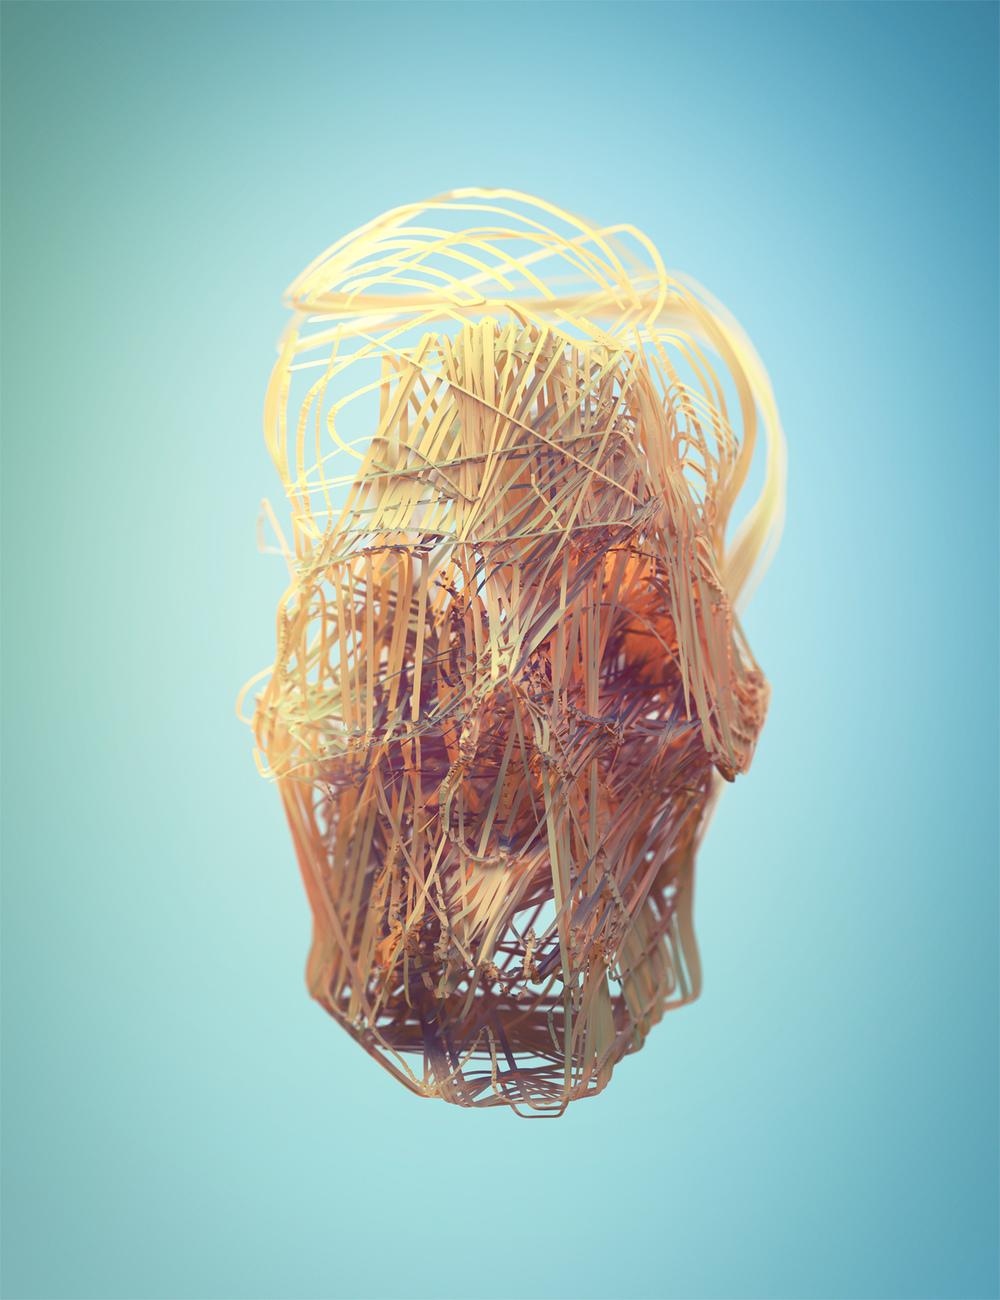 Rubberband_skull_1500px.jpg